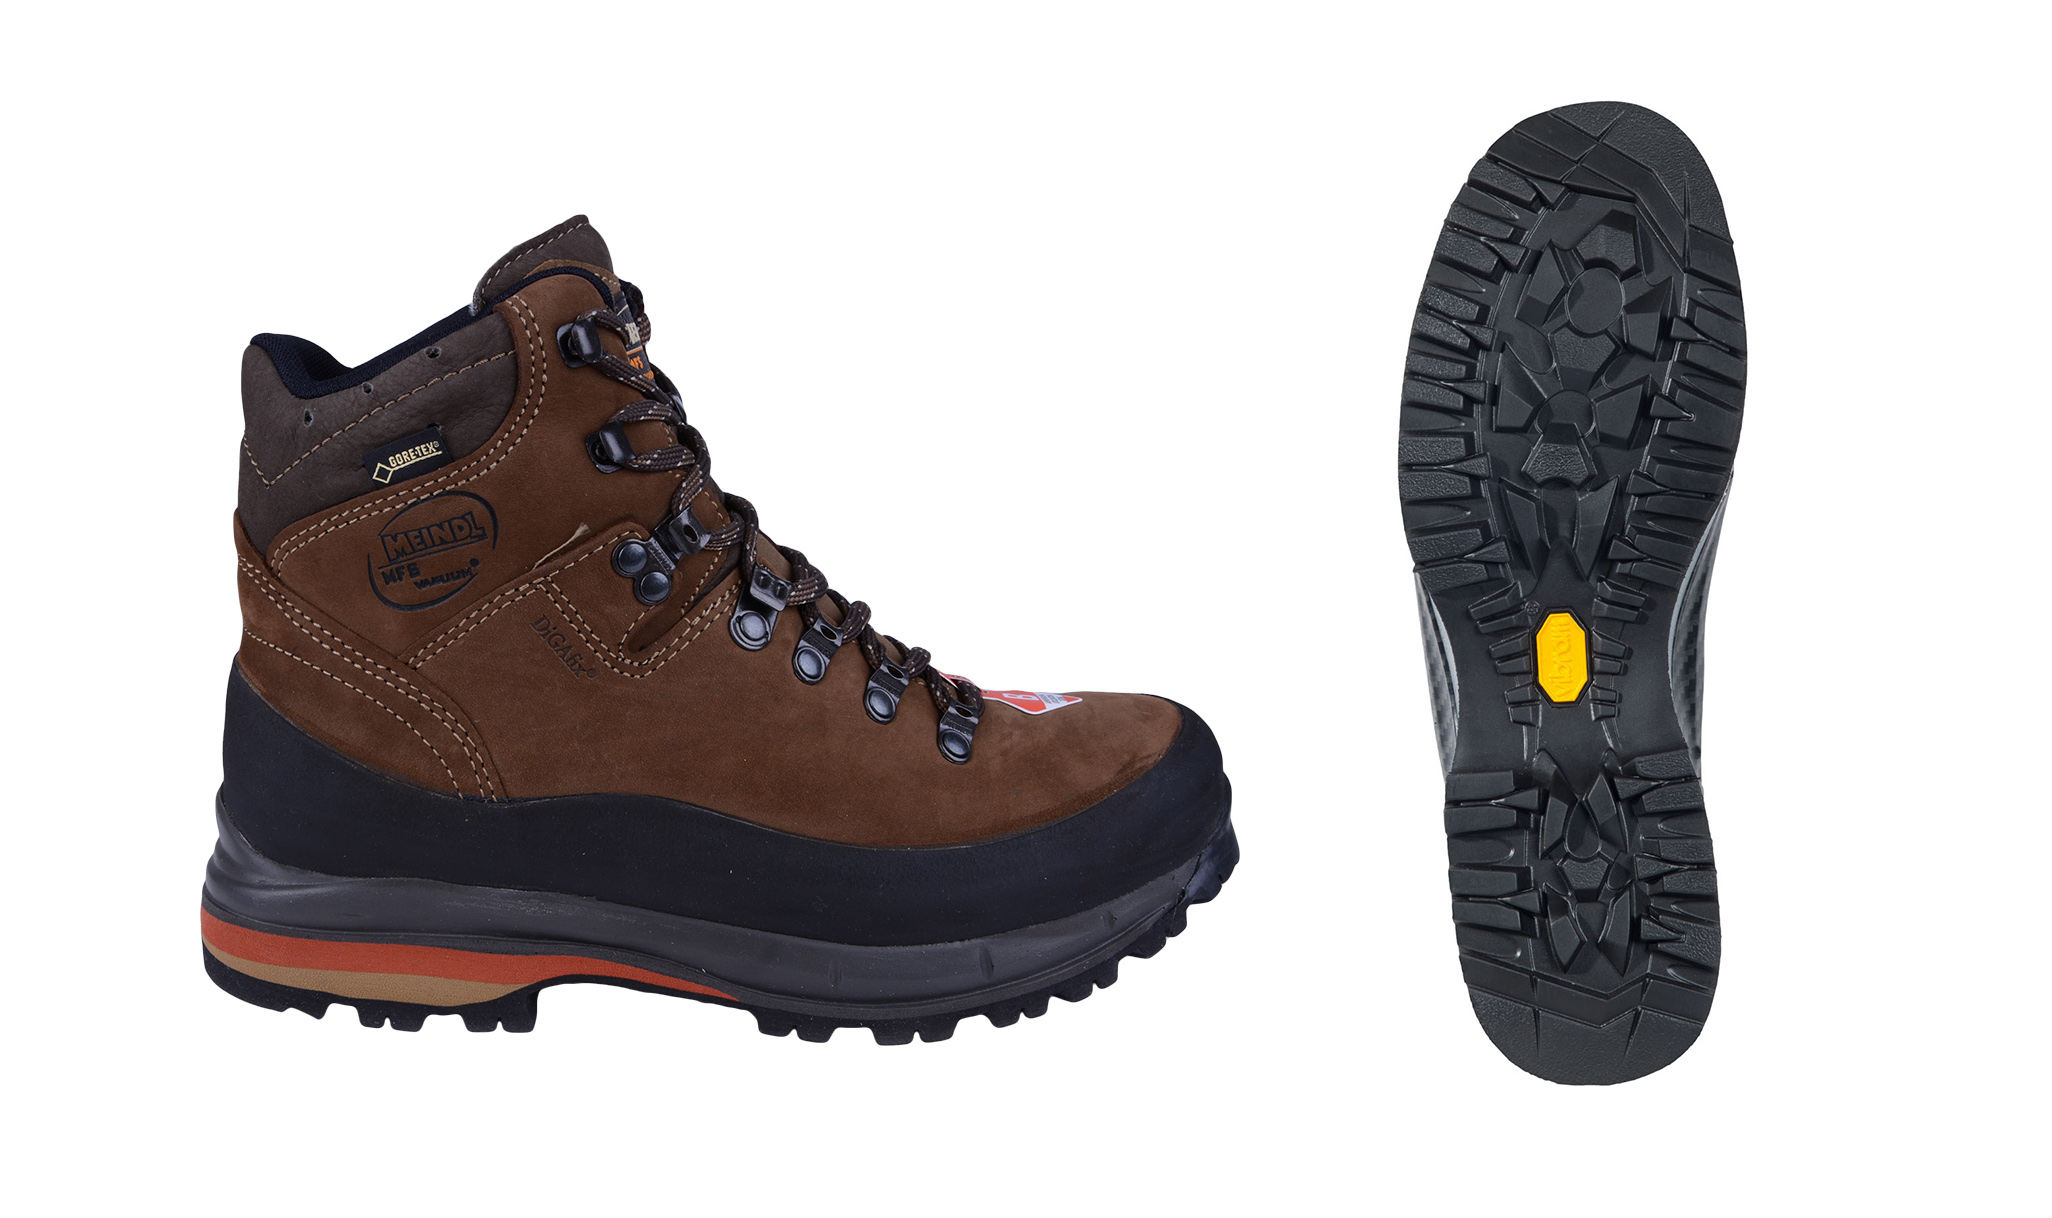 Jakie buty w góry? Blog Outdoorzy.pl